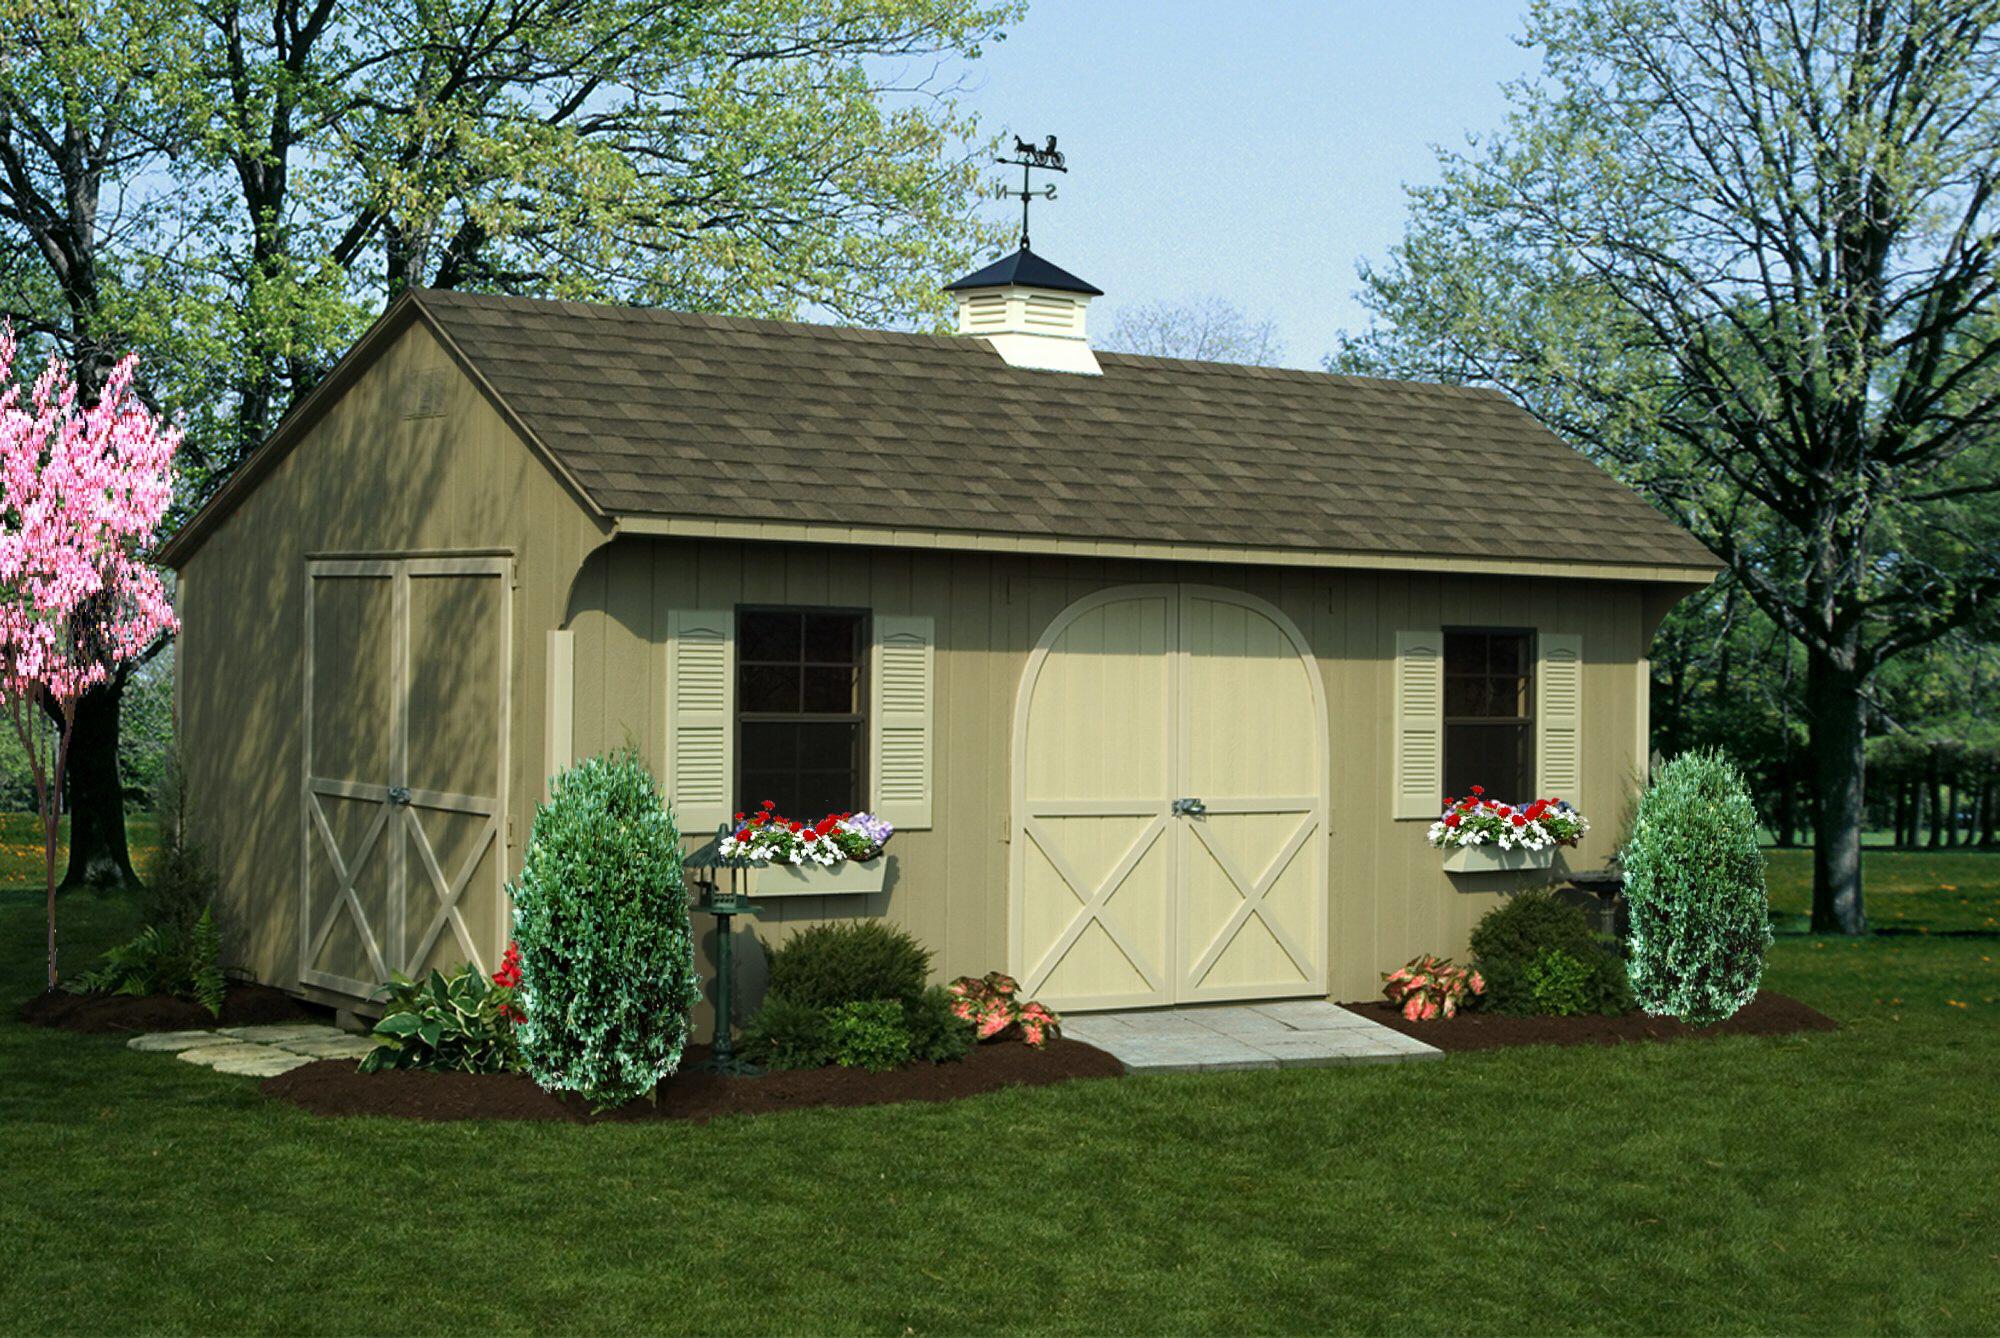 deluxe quaker shed 12 x20 ft - Garden Sheds Nj